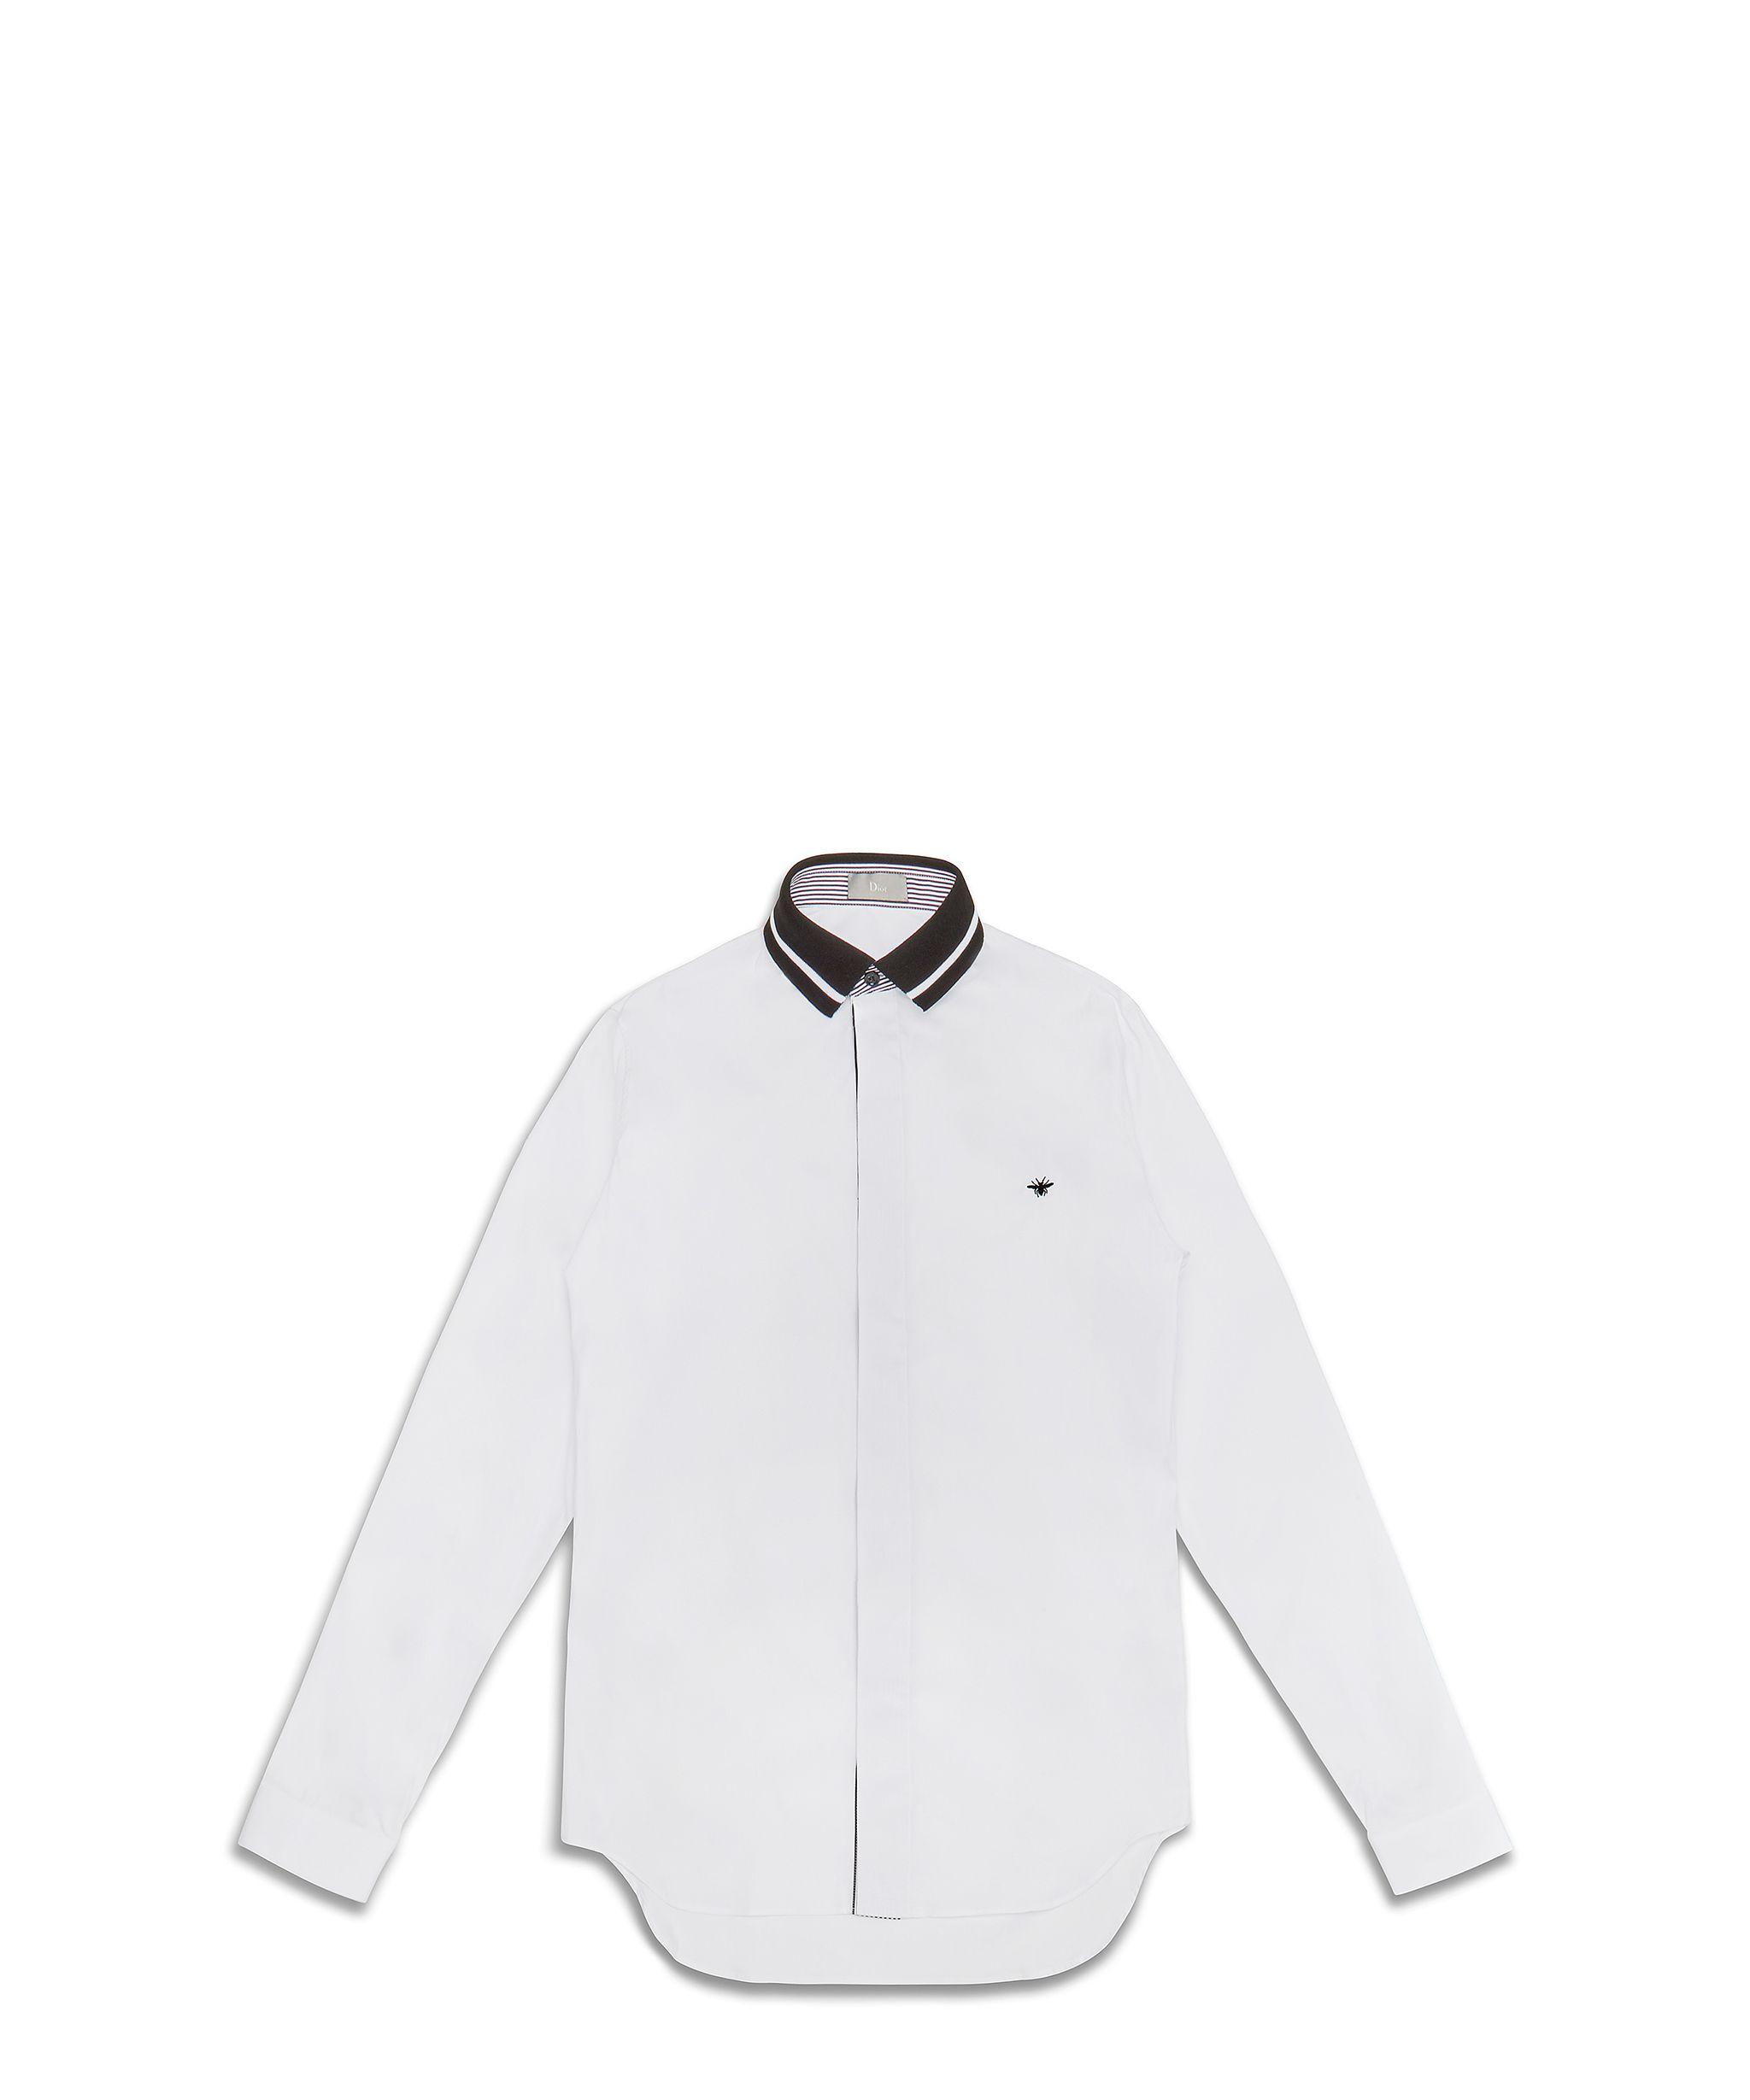 aba55928399c Dior Homme Chemise en coton blanc, broderie abeille, 390 euros   Mode homme    Menswear   Chemise, Broderie abeille et Mode